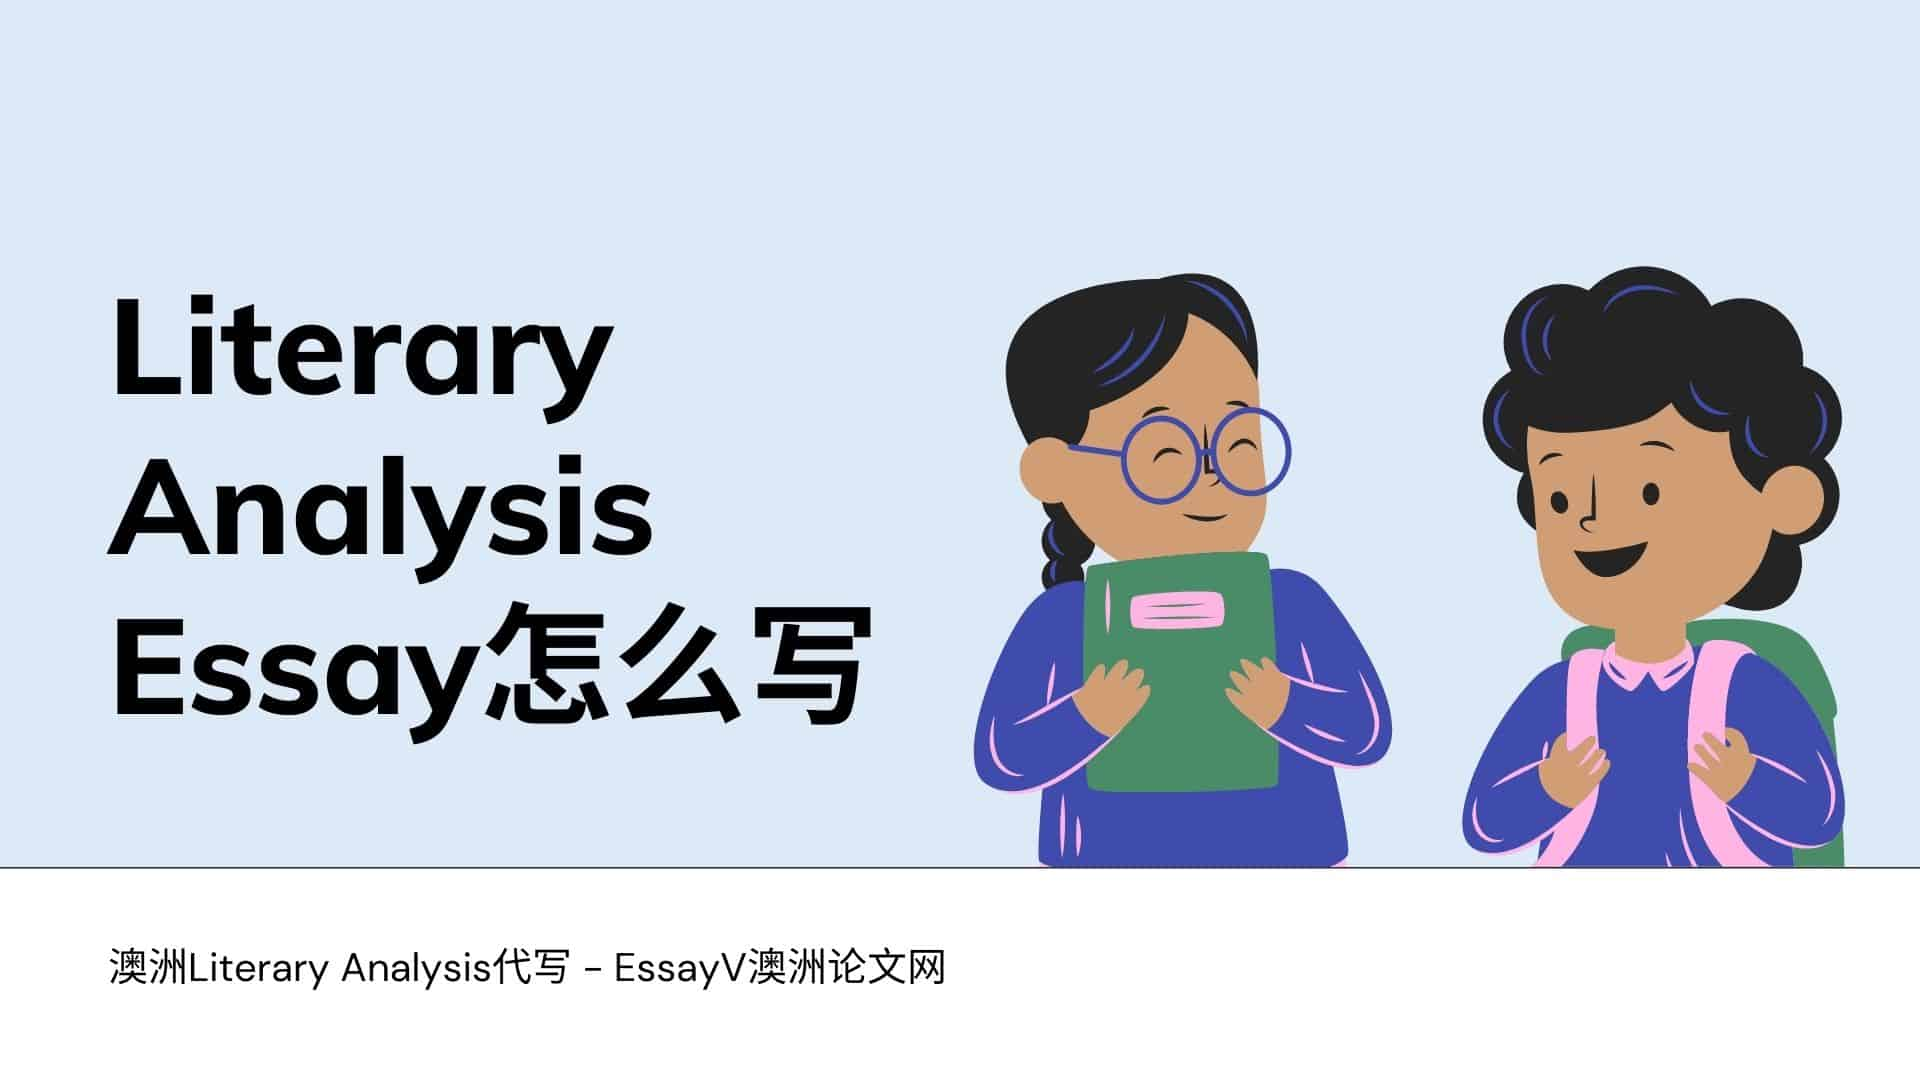 Literary Analysis Essay怎么写